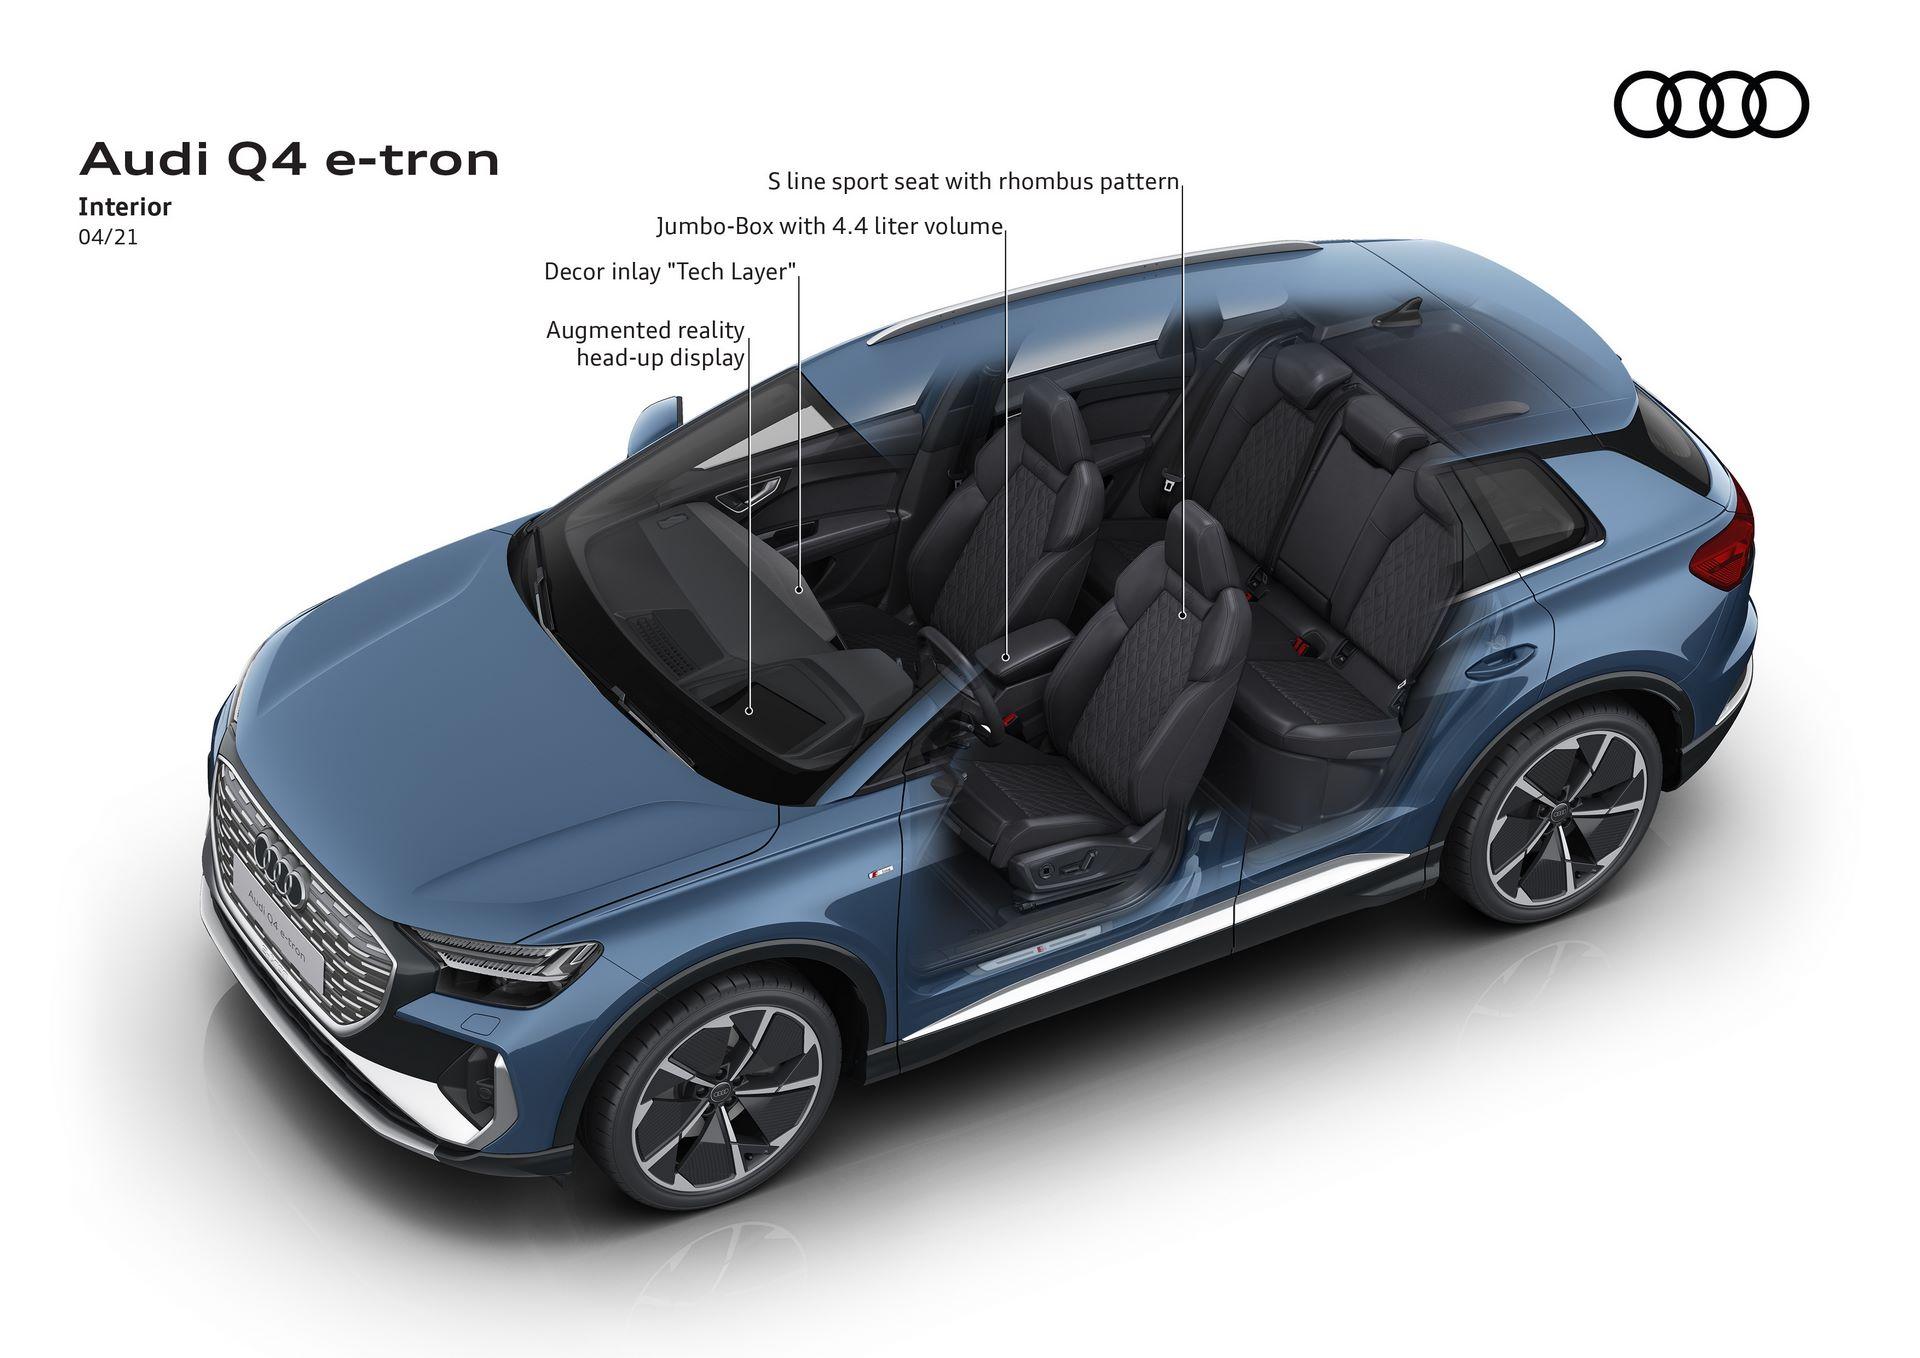 Audi-Q4-e-tron-and-Q4-e-tron-Sportback-104